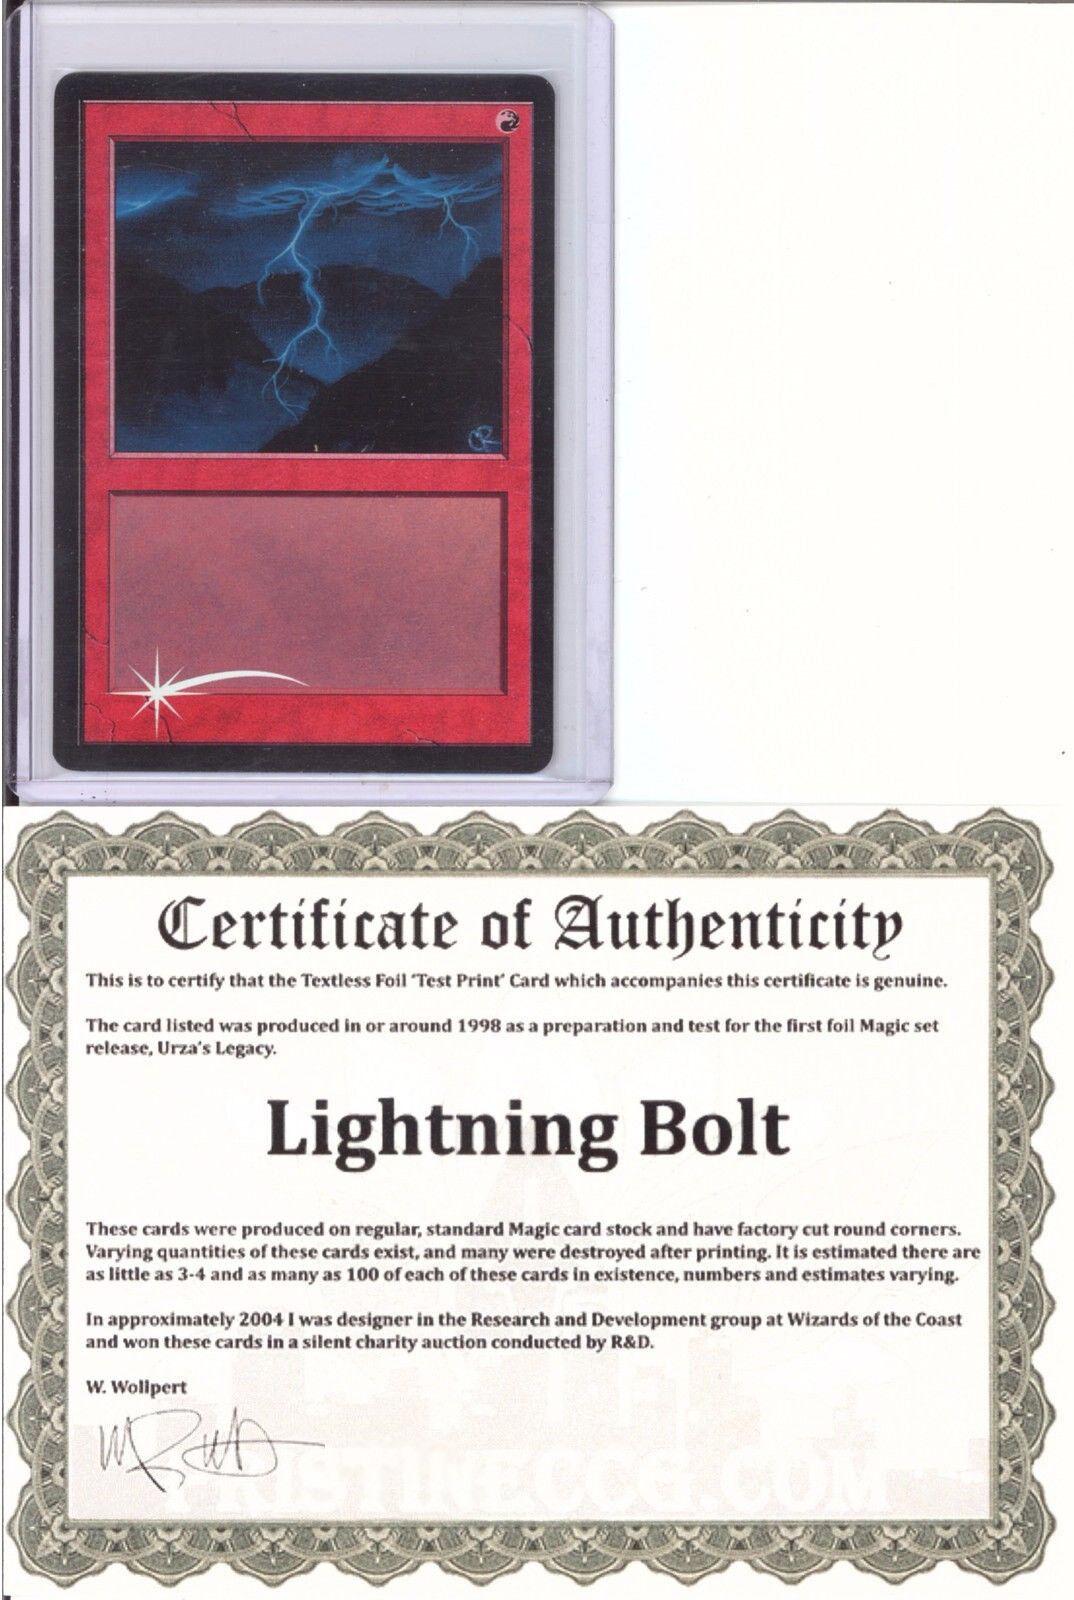 lightning bolt textless foil test print mtg magic the